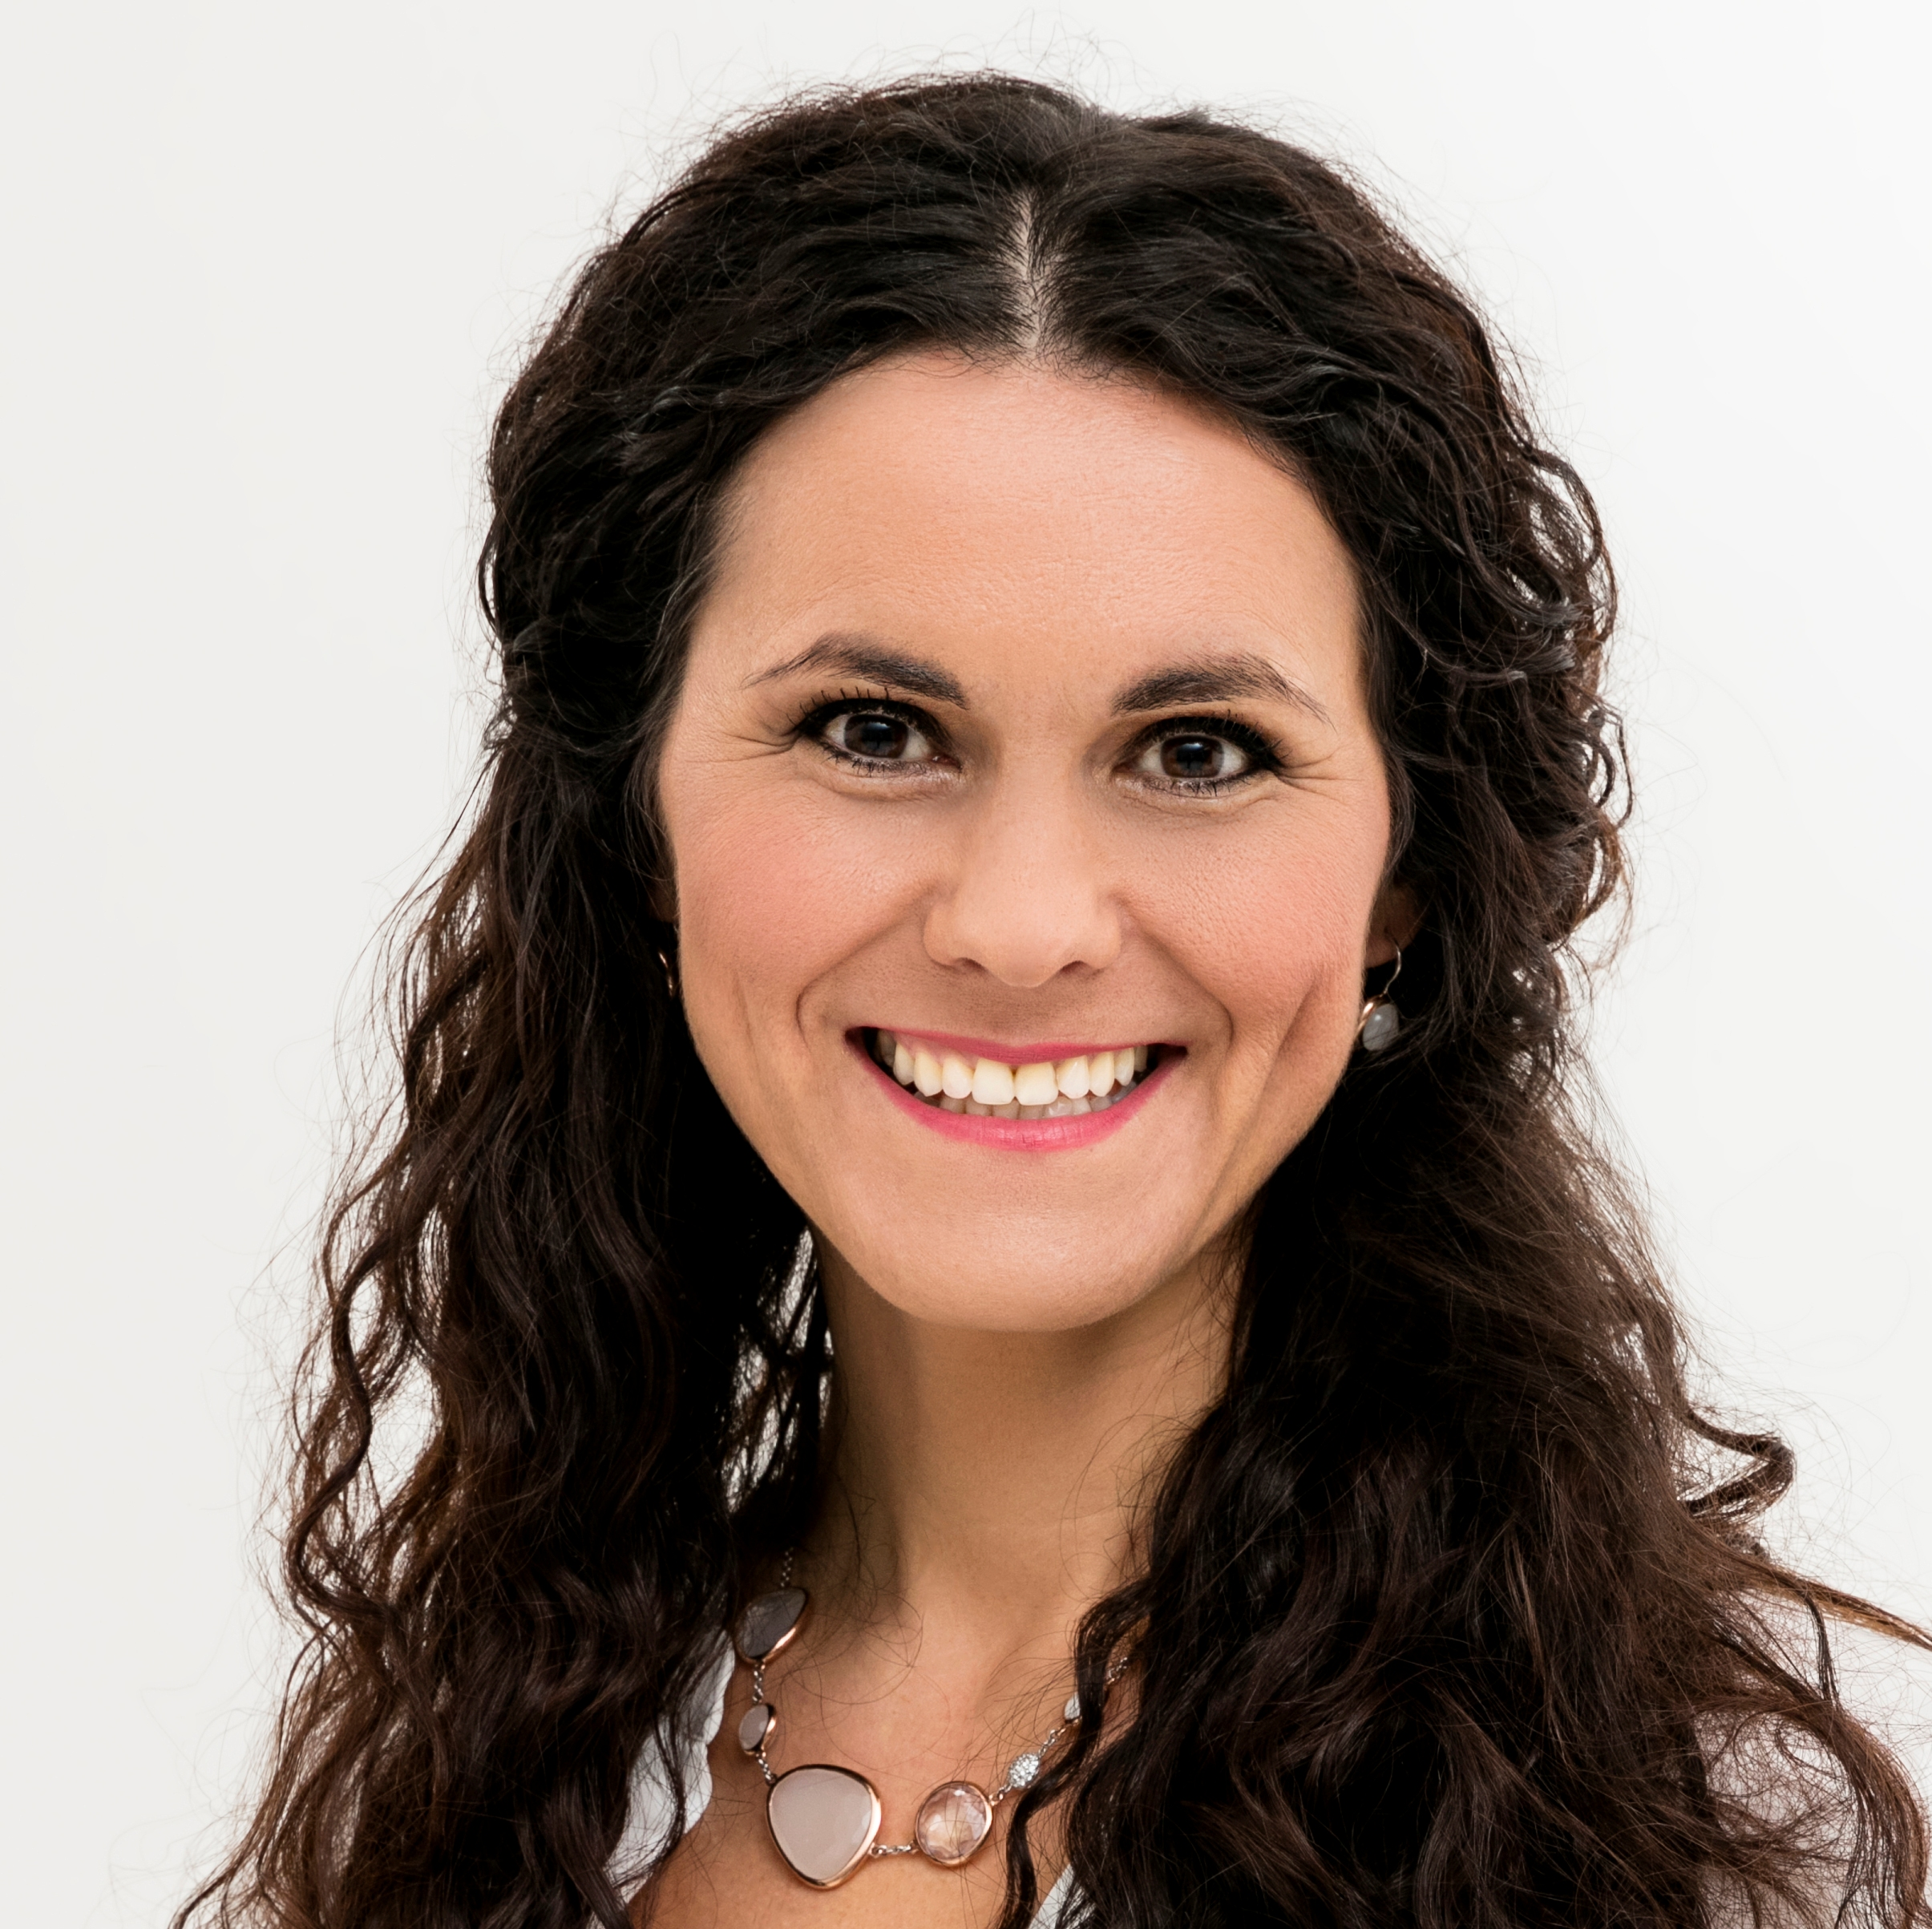 Janette Šimková